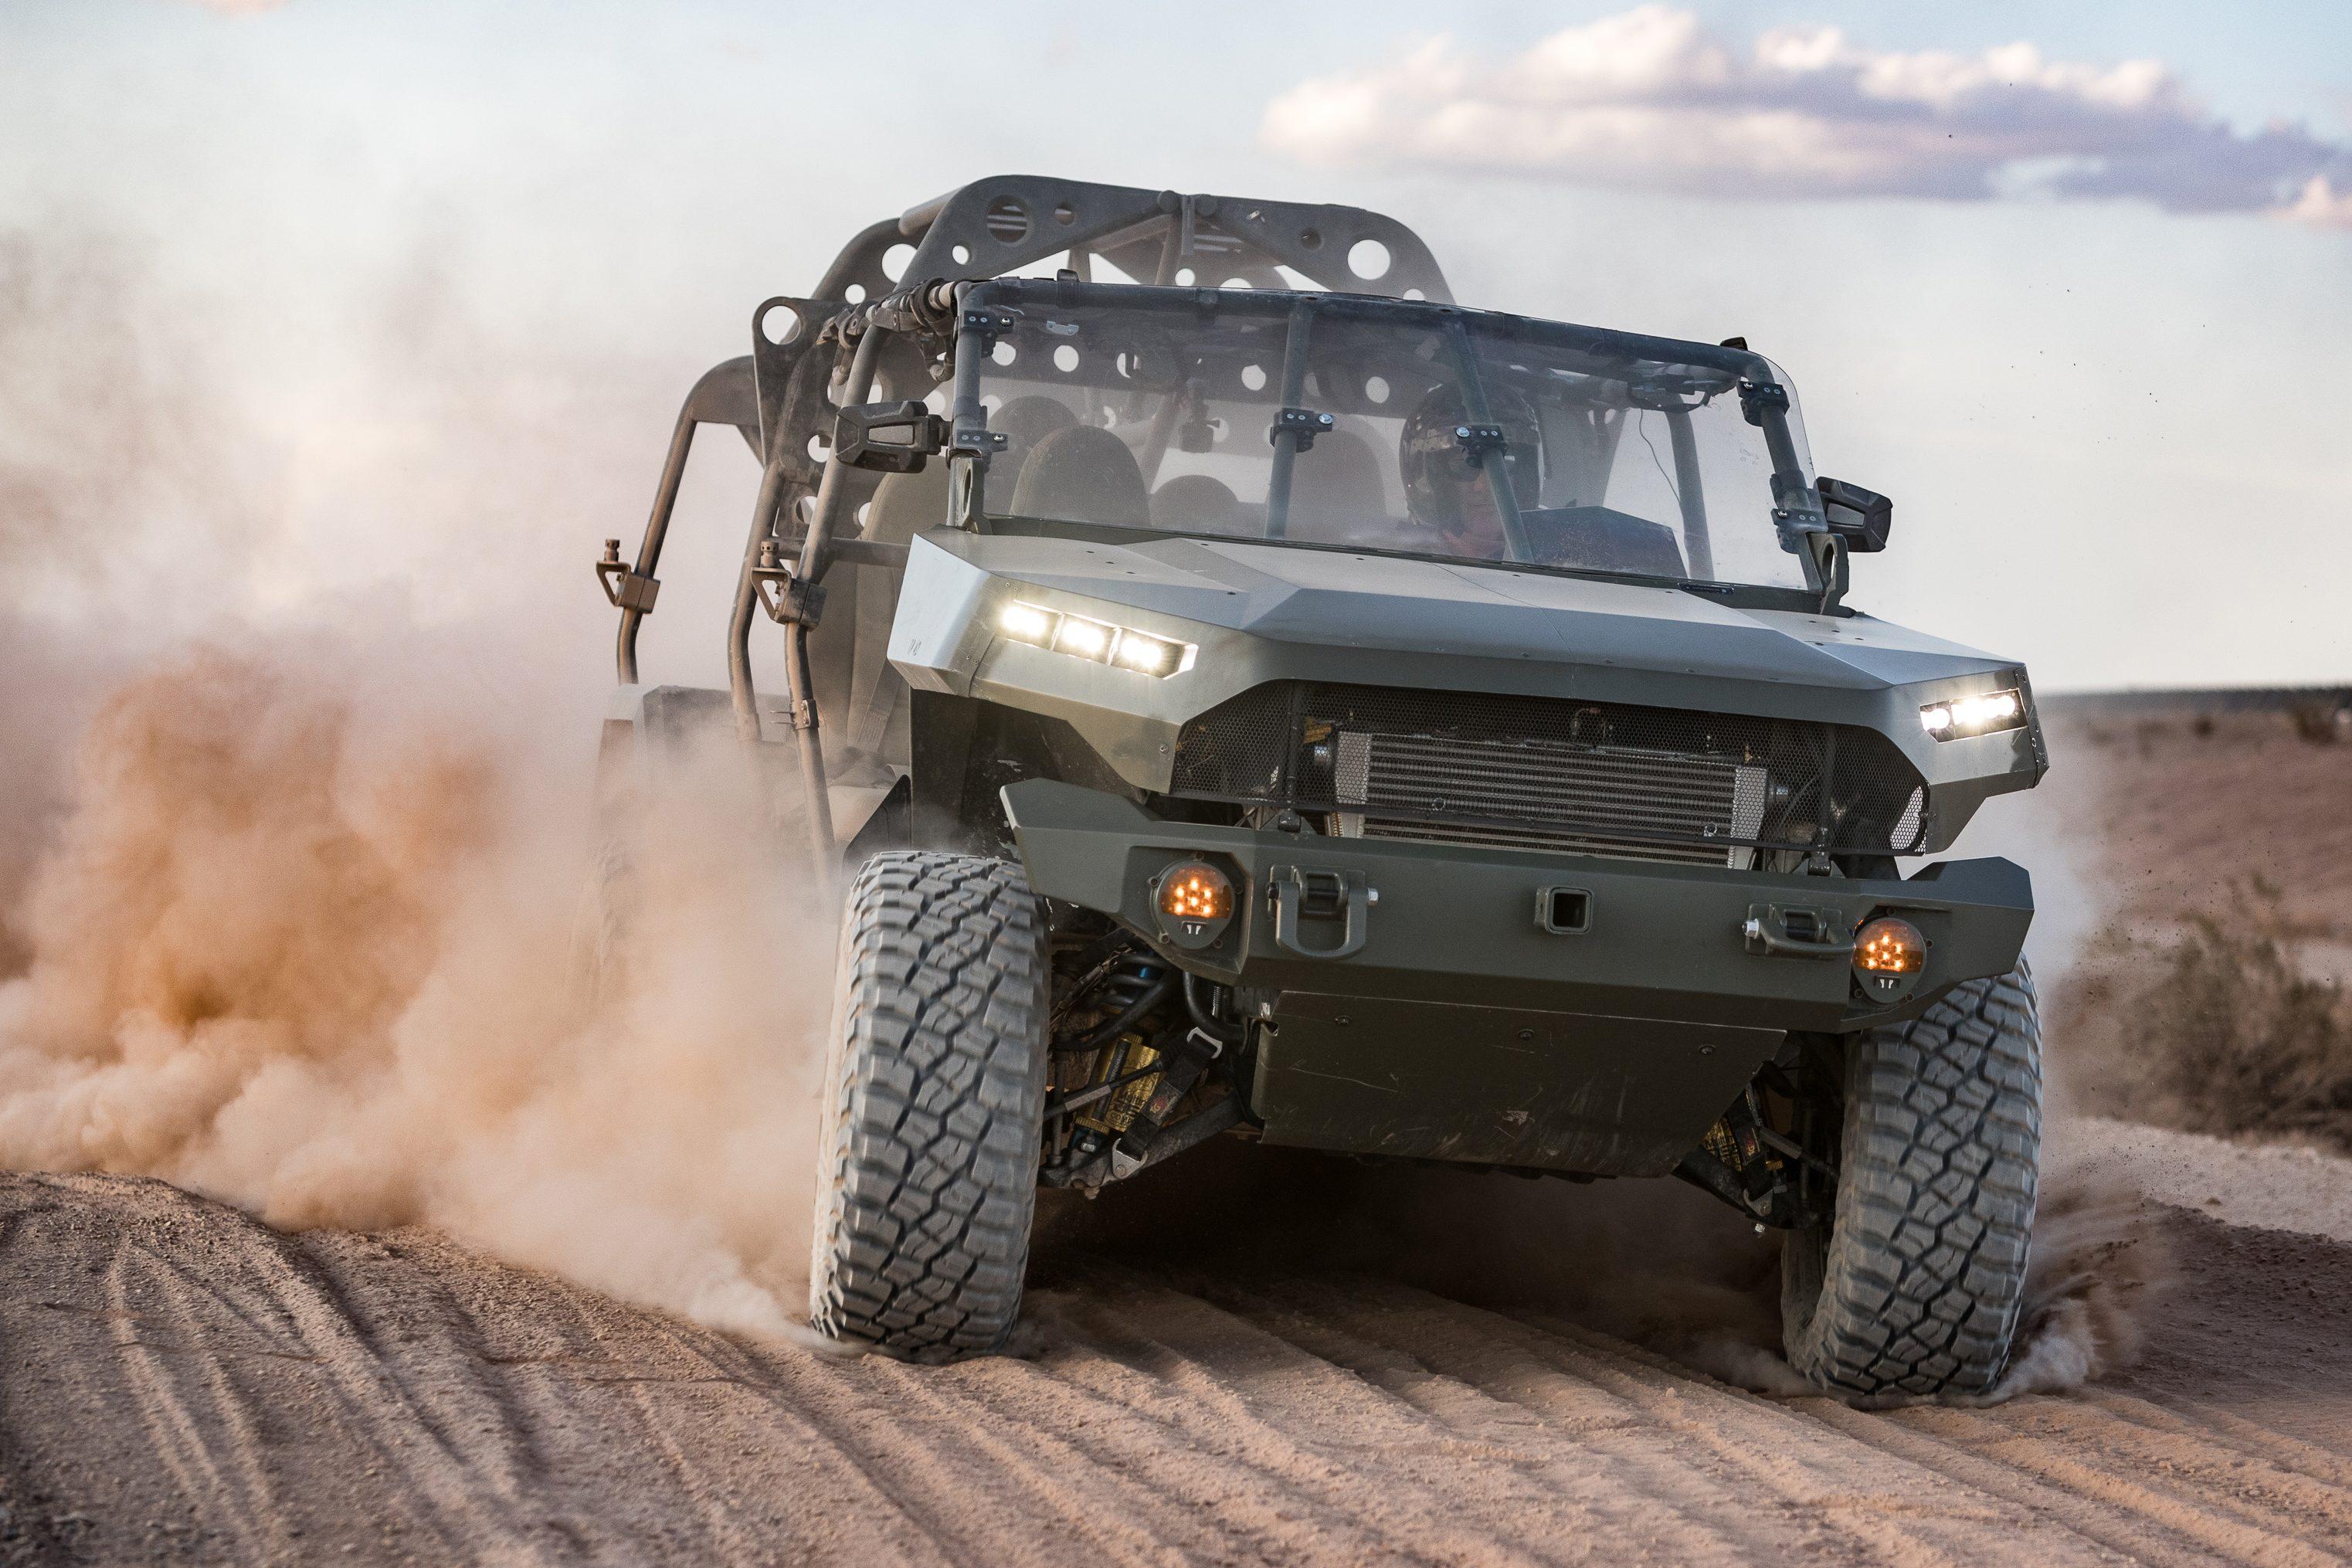 Este veículo brutal do Exército dos EUA usa base e motor da Chevrolet S10